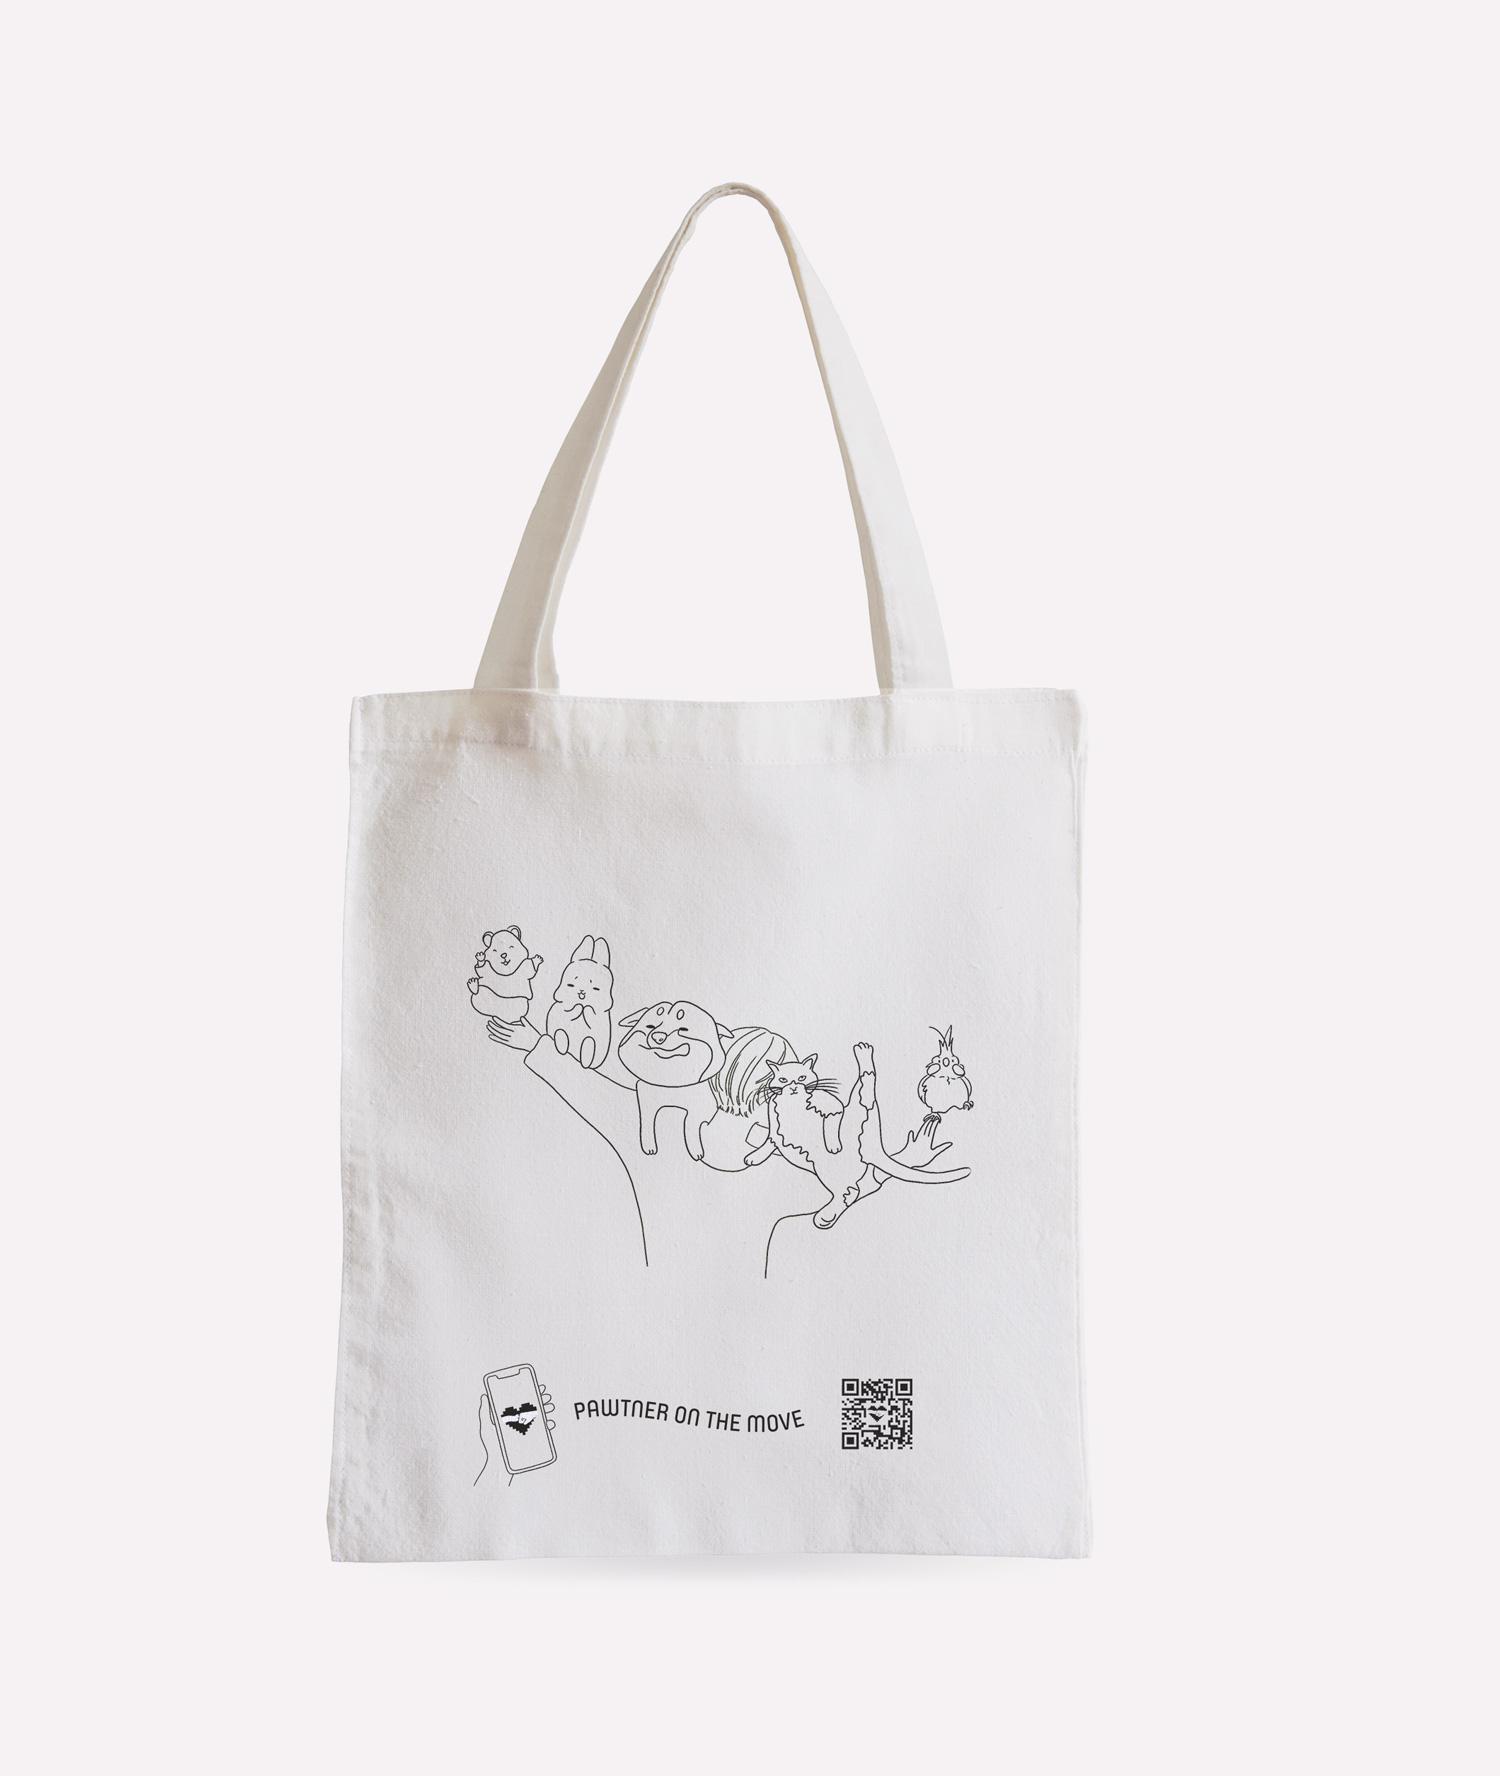 bag_mock_up_bright-1500